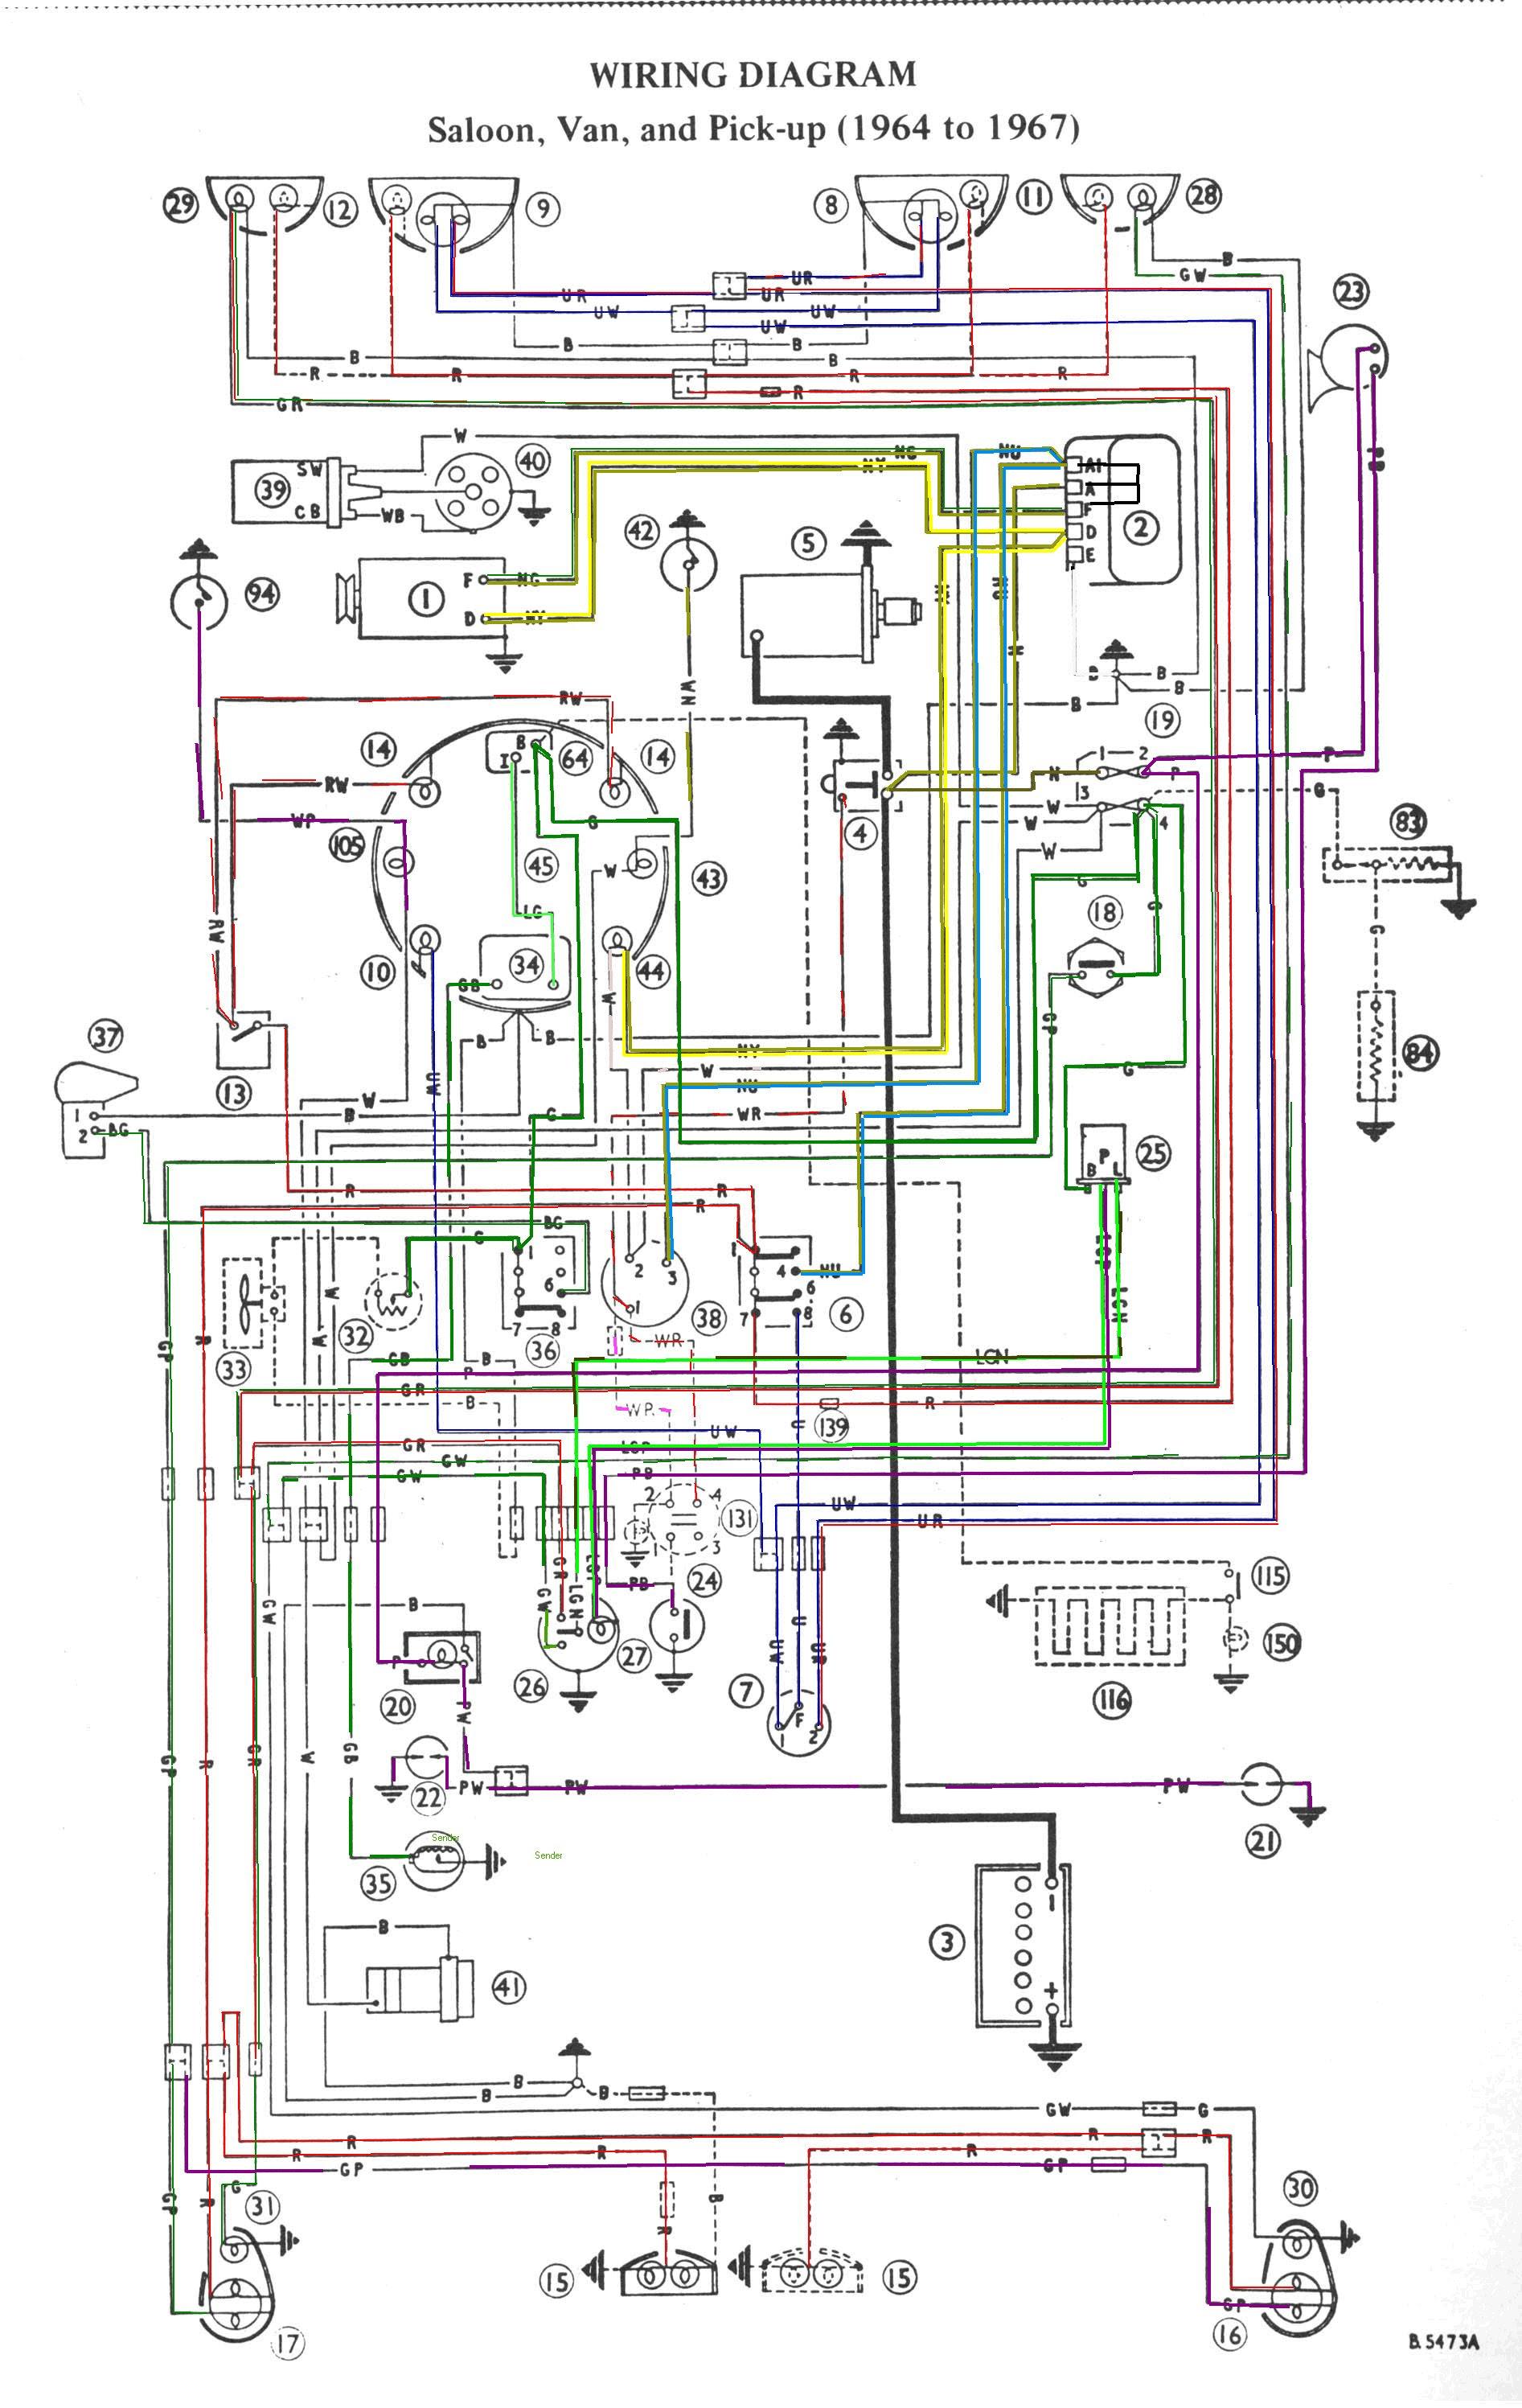 Diagram Mitsubishi Starion Wiring Harness Diagram Full Version Hd Quality Harness Diagram Ppcdiagraml Centroricambicucine It